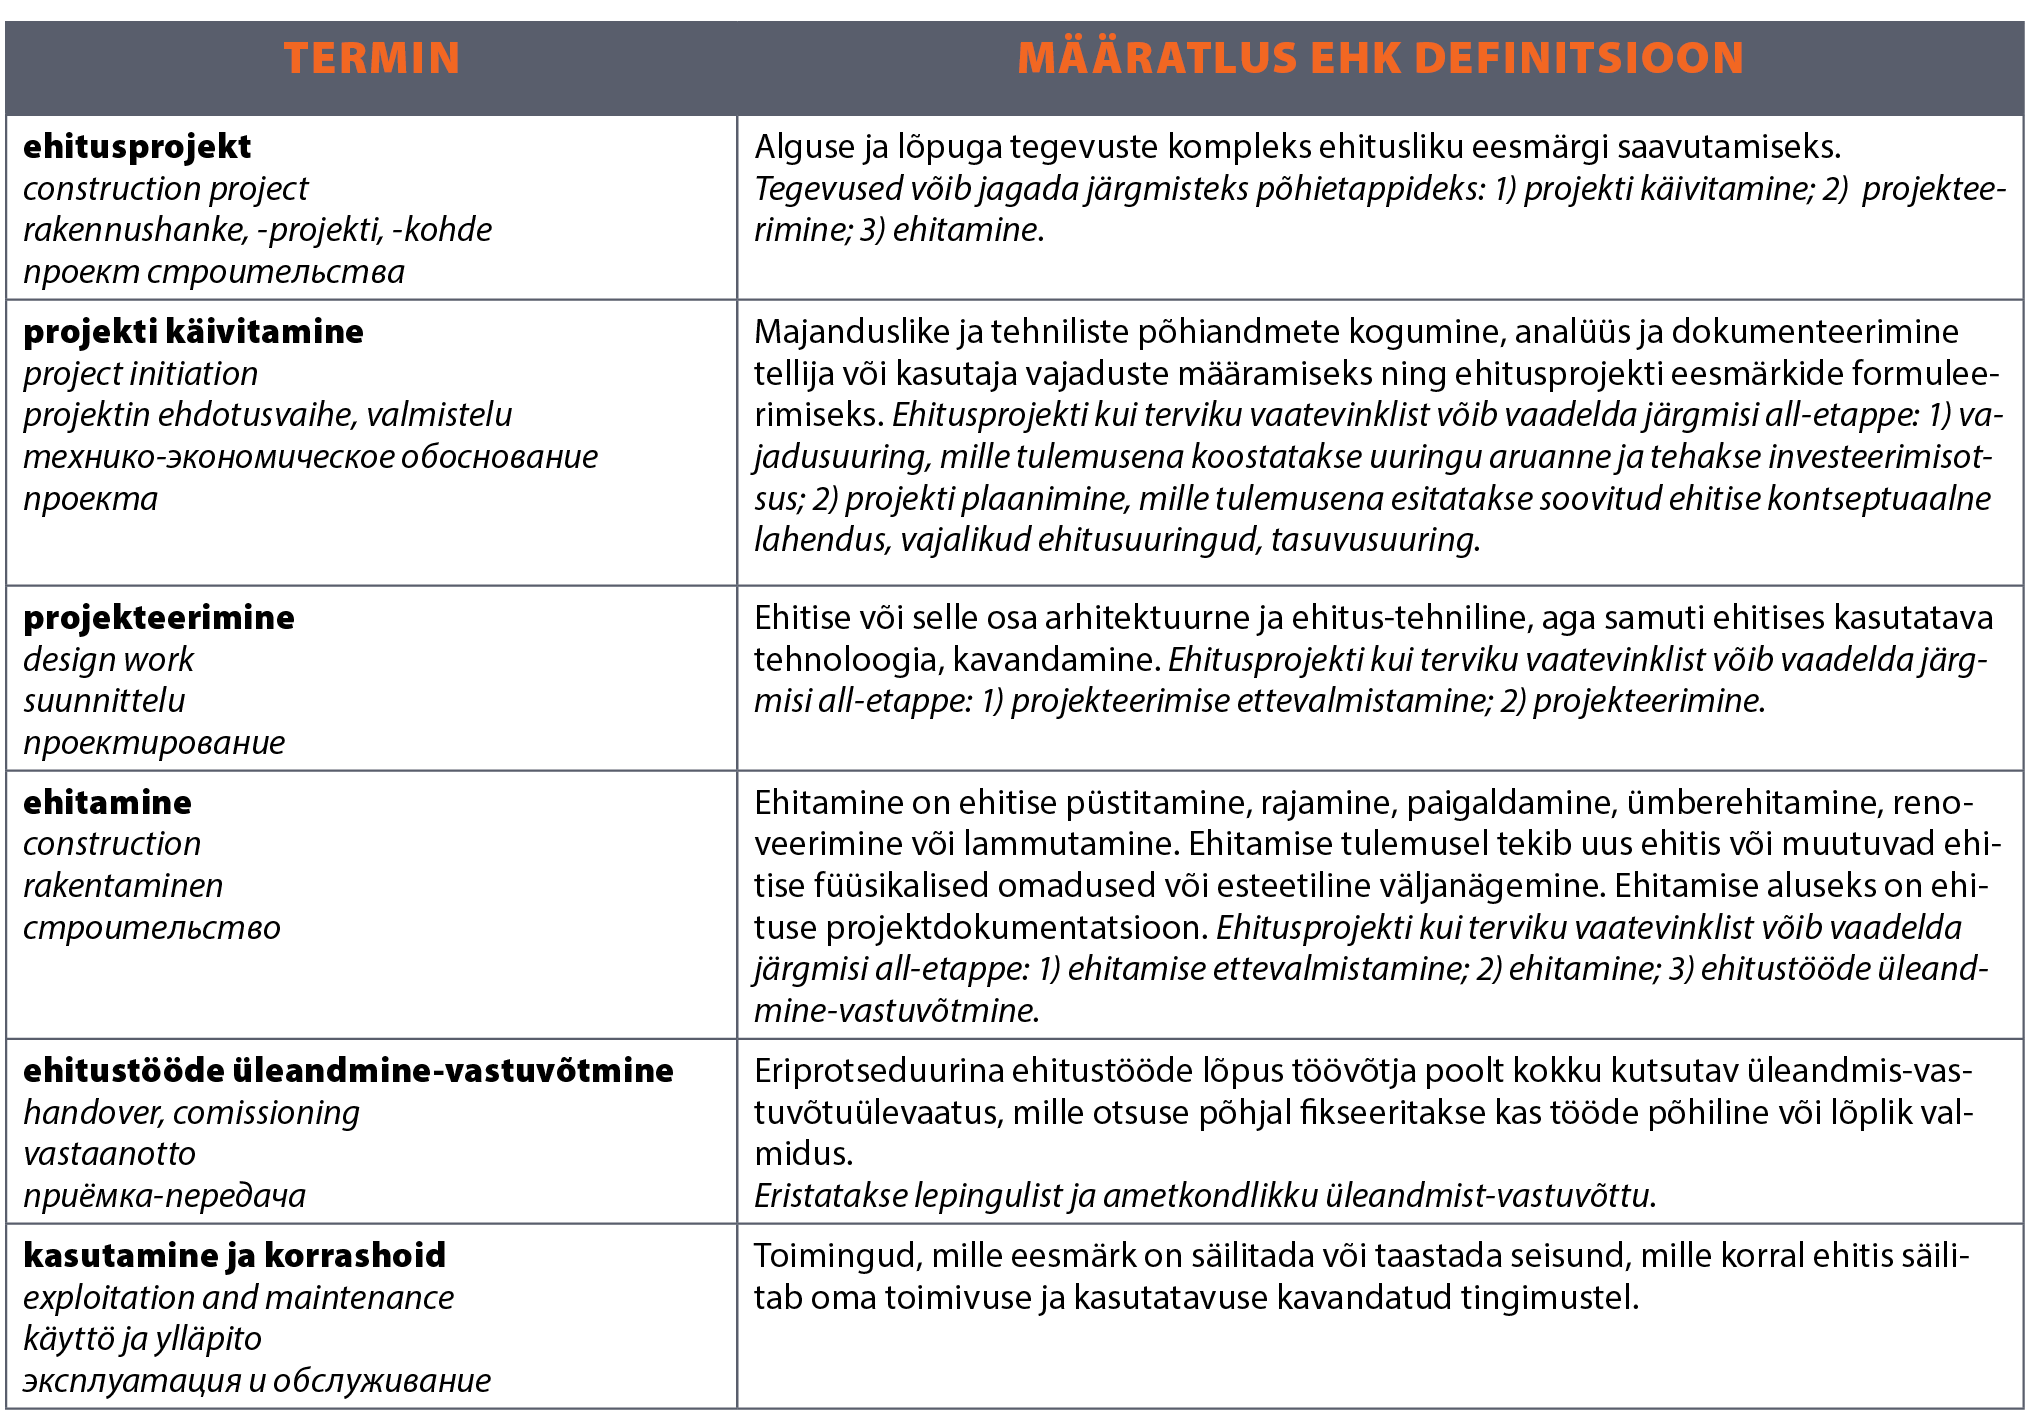 Ehitusprojekti tabel